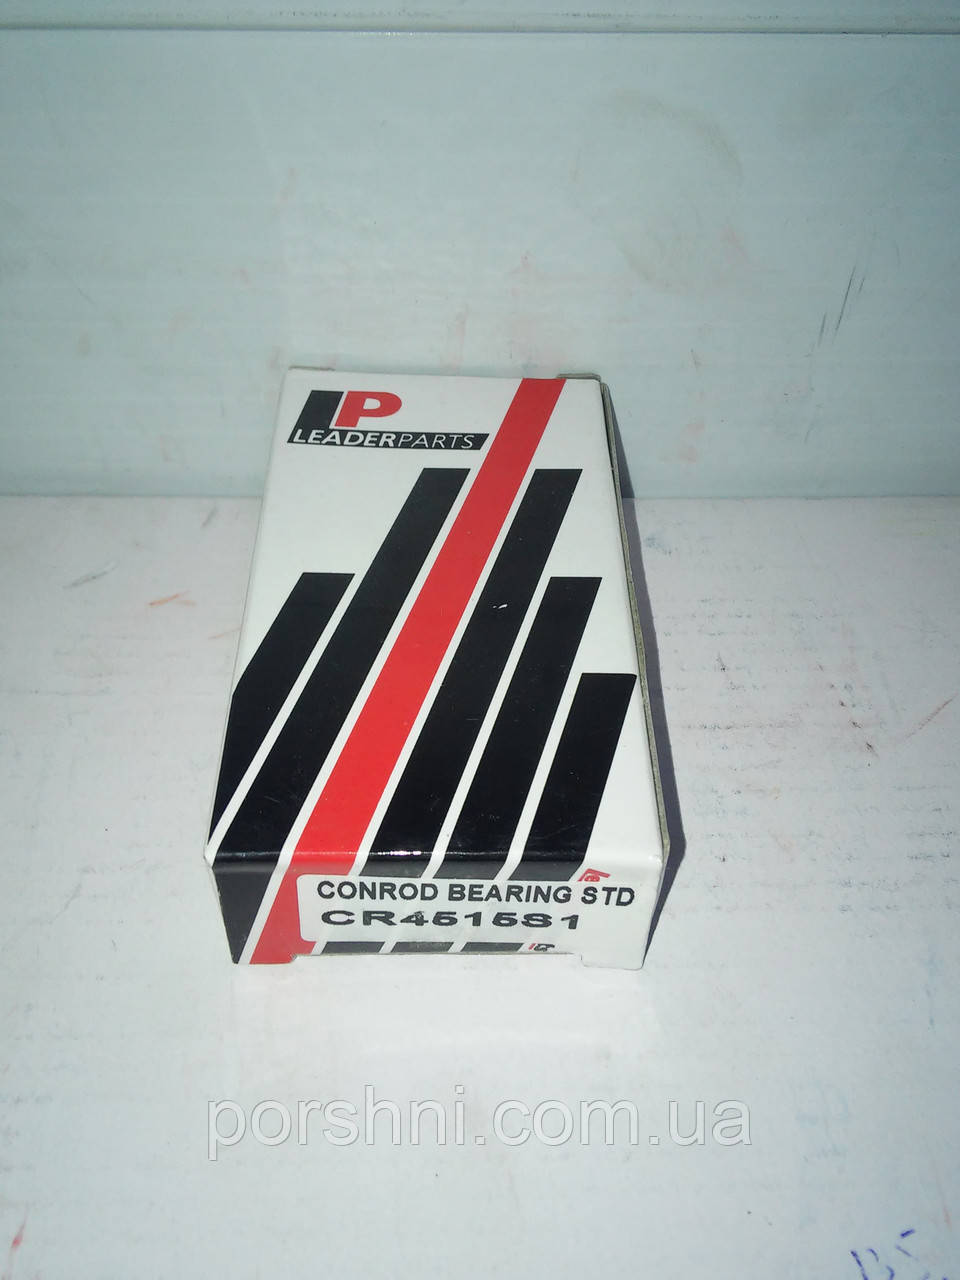 Вкладыши Форд  2,0  V 6  0,10  шатун Leaderparts   CR642AM 0.25